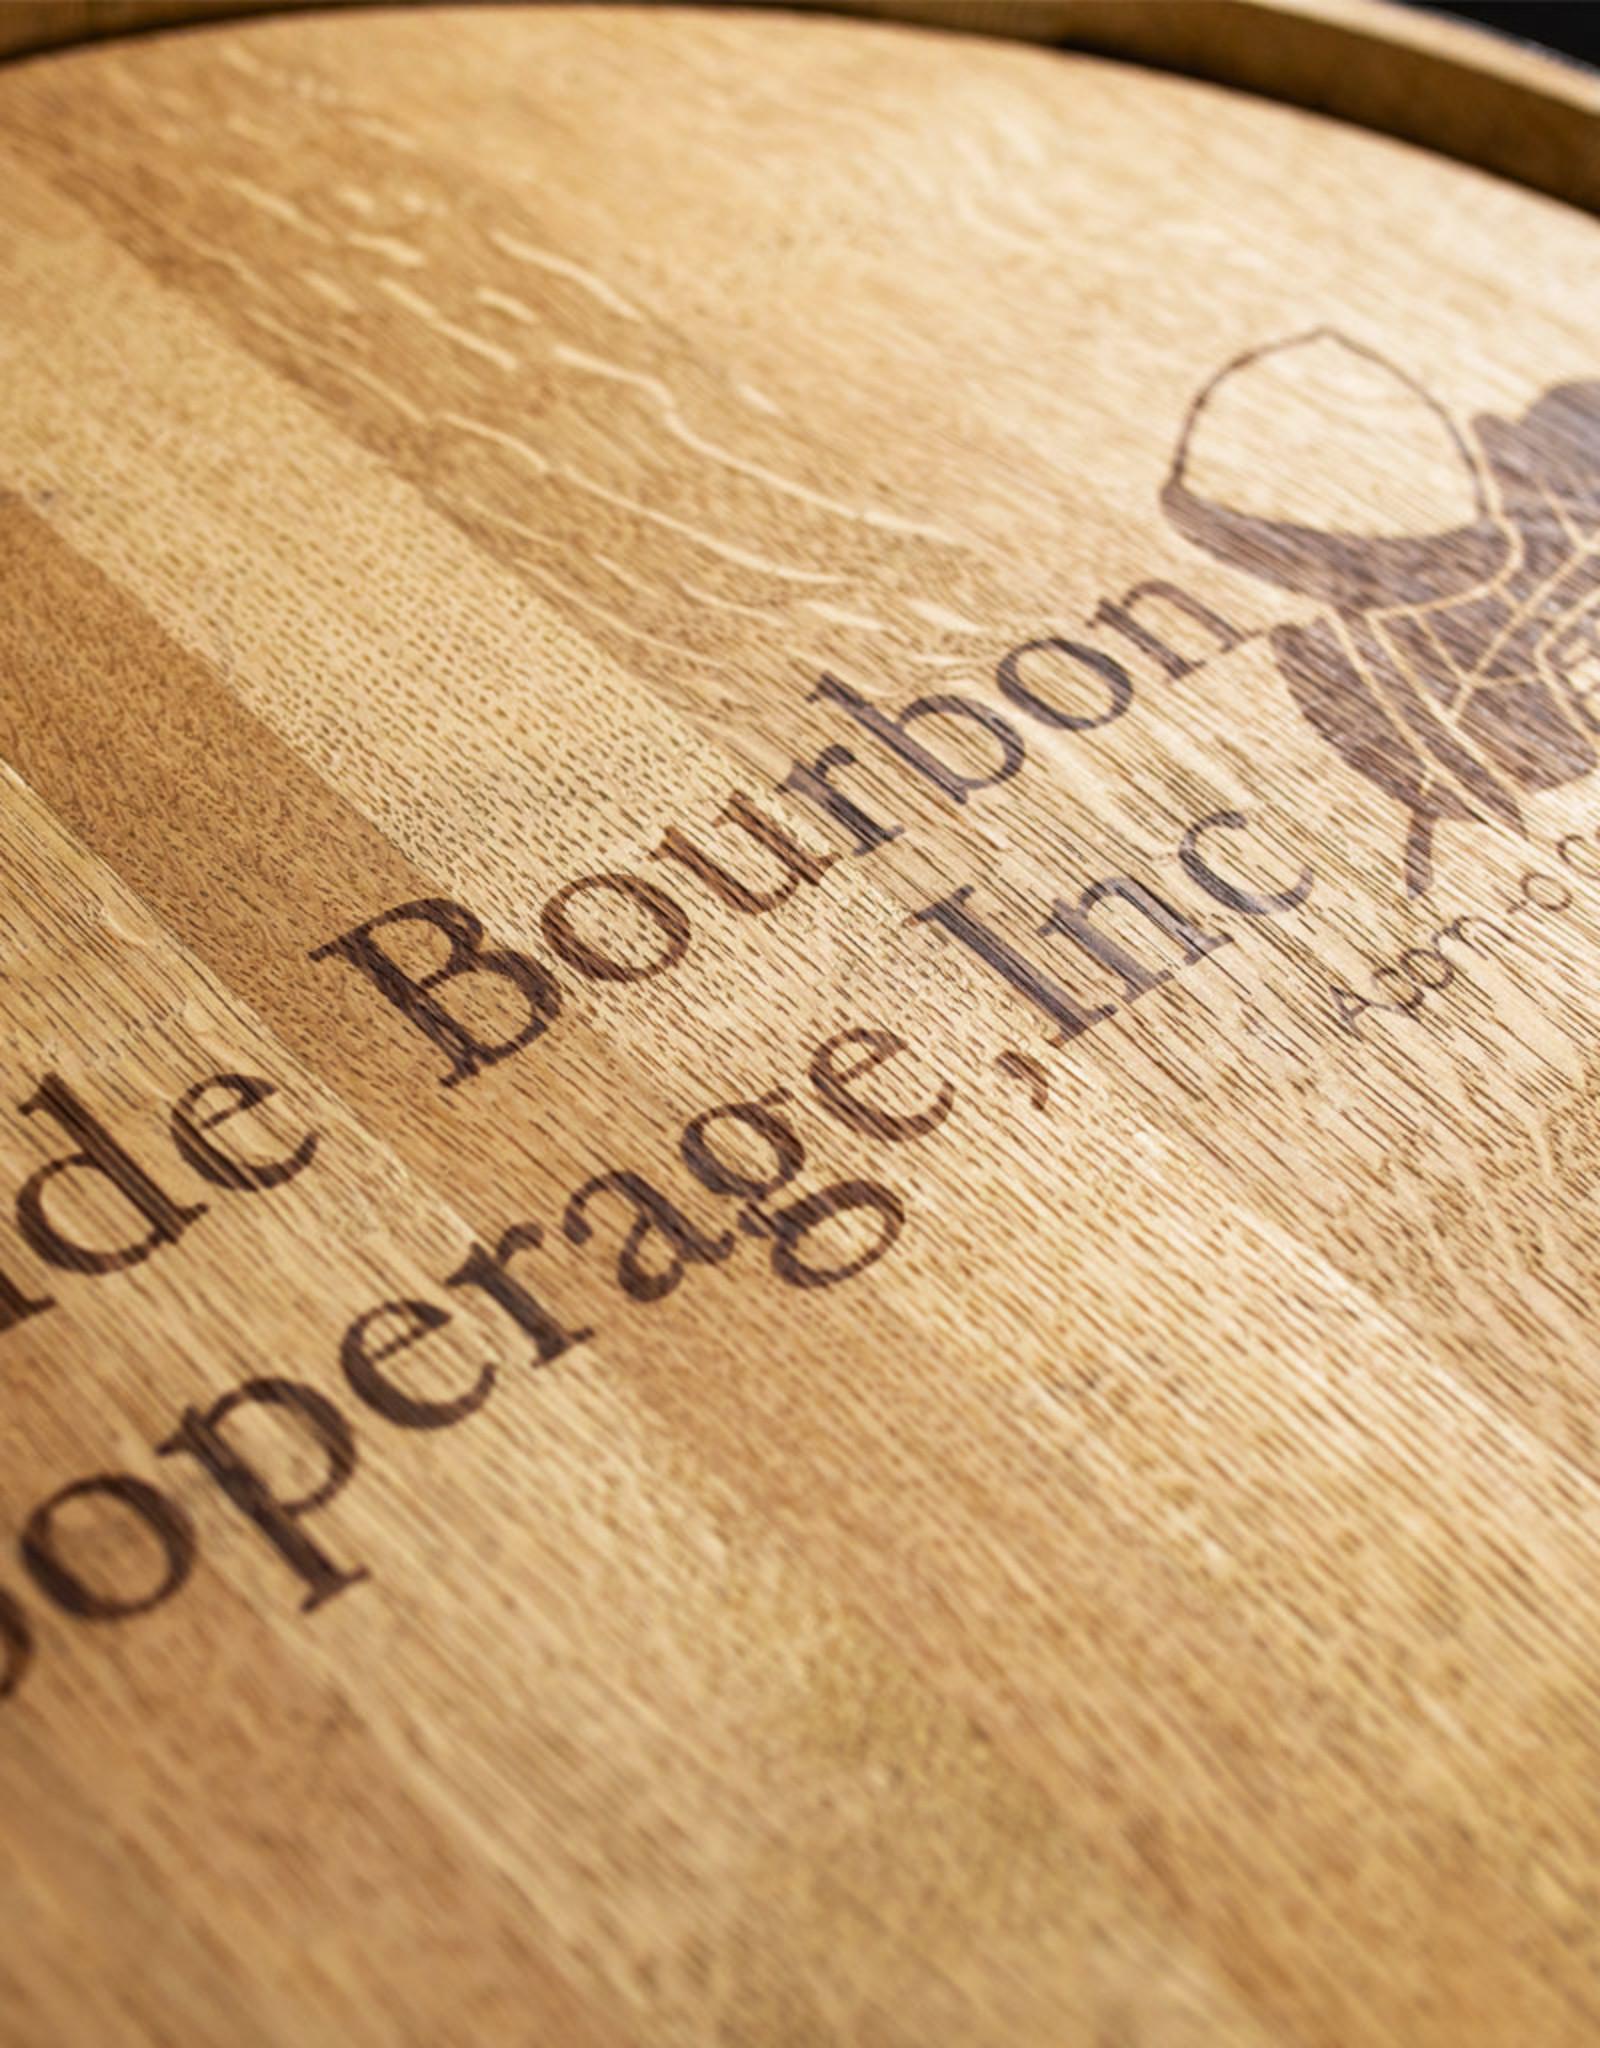 200 L SPEYSIDE BOURBON COOPERAGE® BOURBON BARREL CLASSIC